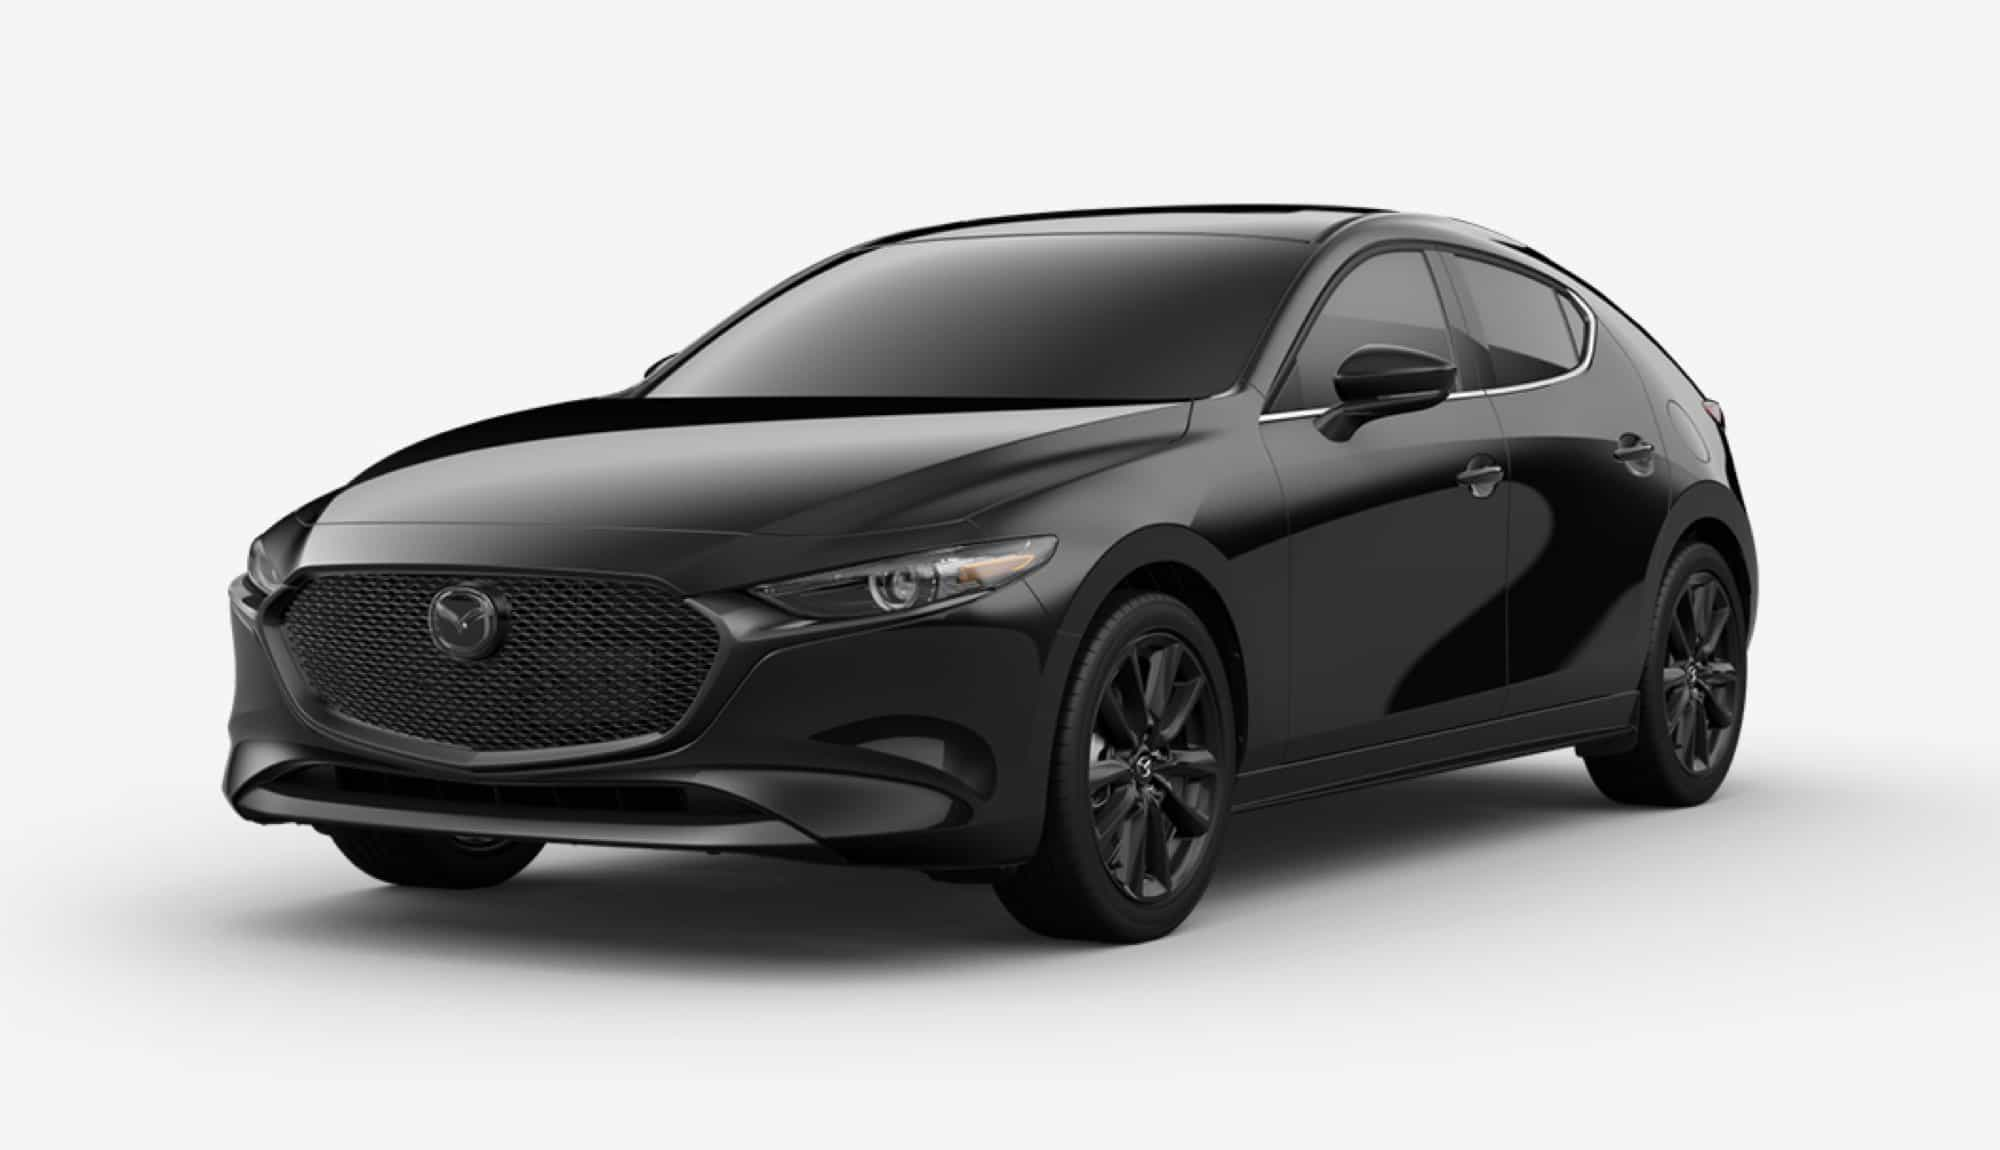 2020 Mazda3 Hatchback, Jet Black Mica